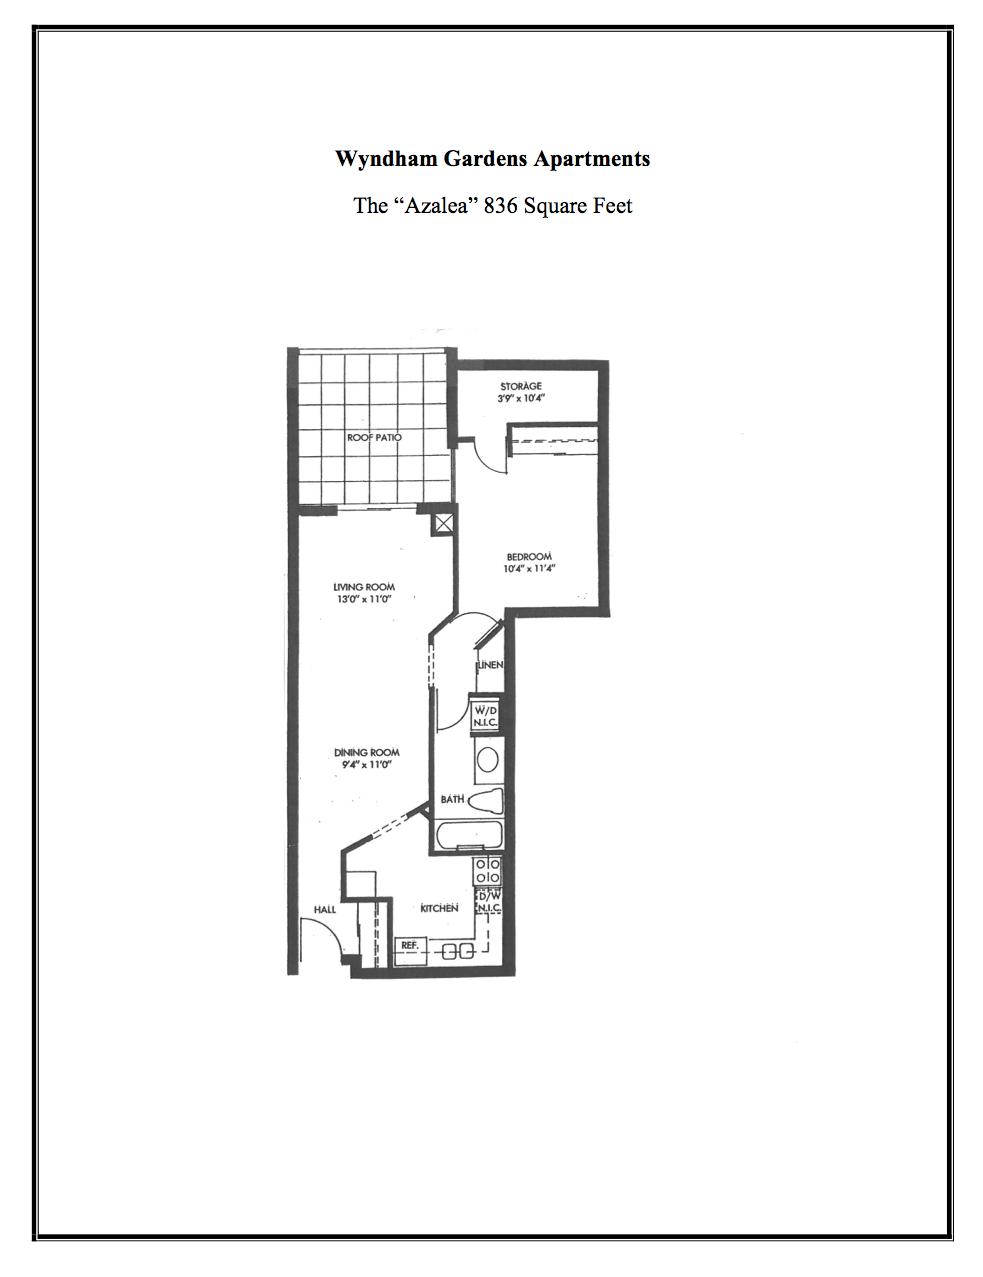 Salon floor plan maker free best free home design for Salon blueprint maker